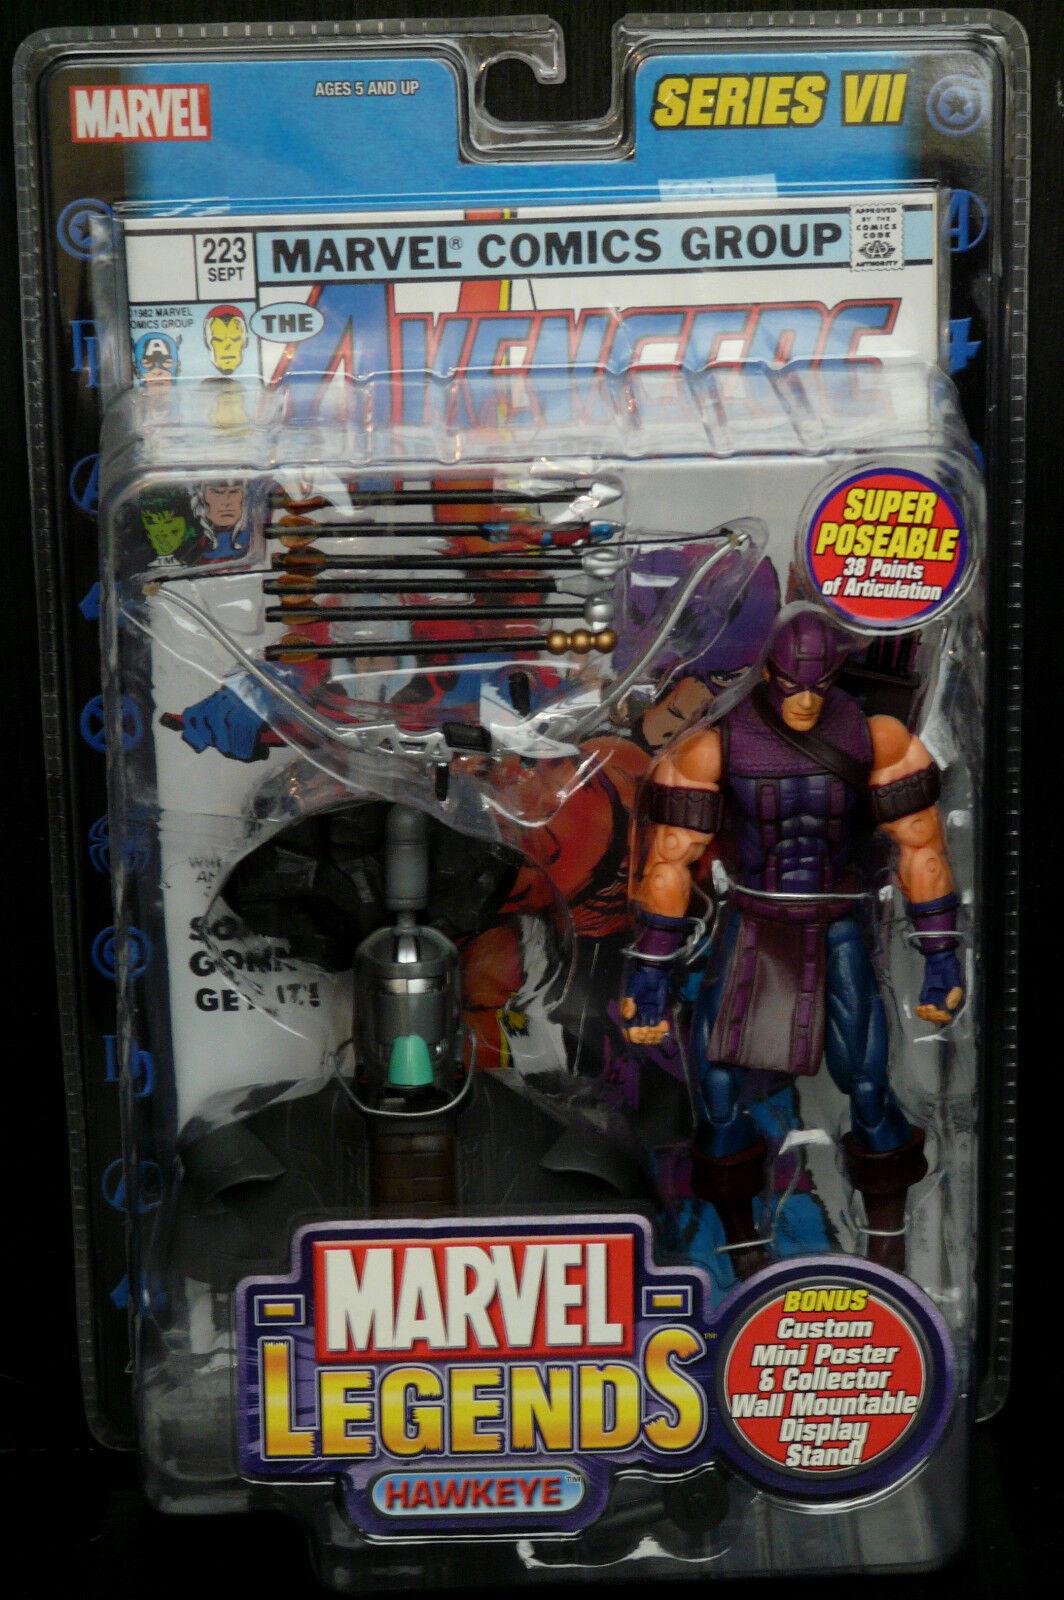 Marvel Legends Legends Legends Series VII (7)  nuevo  Hawkeye (avengers) Figura Rara  6